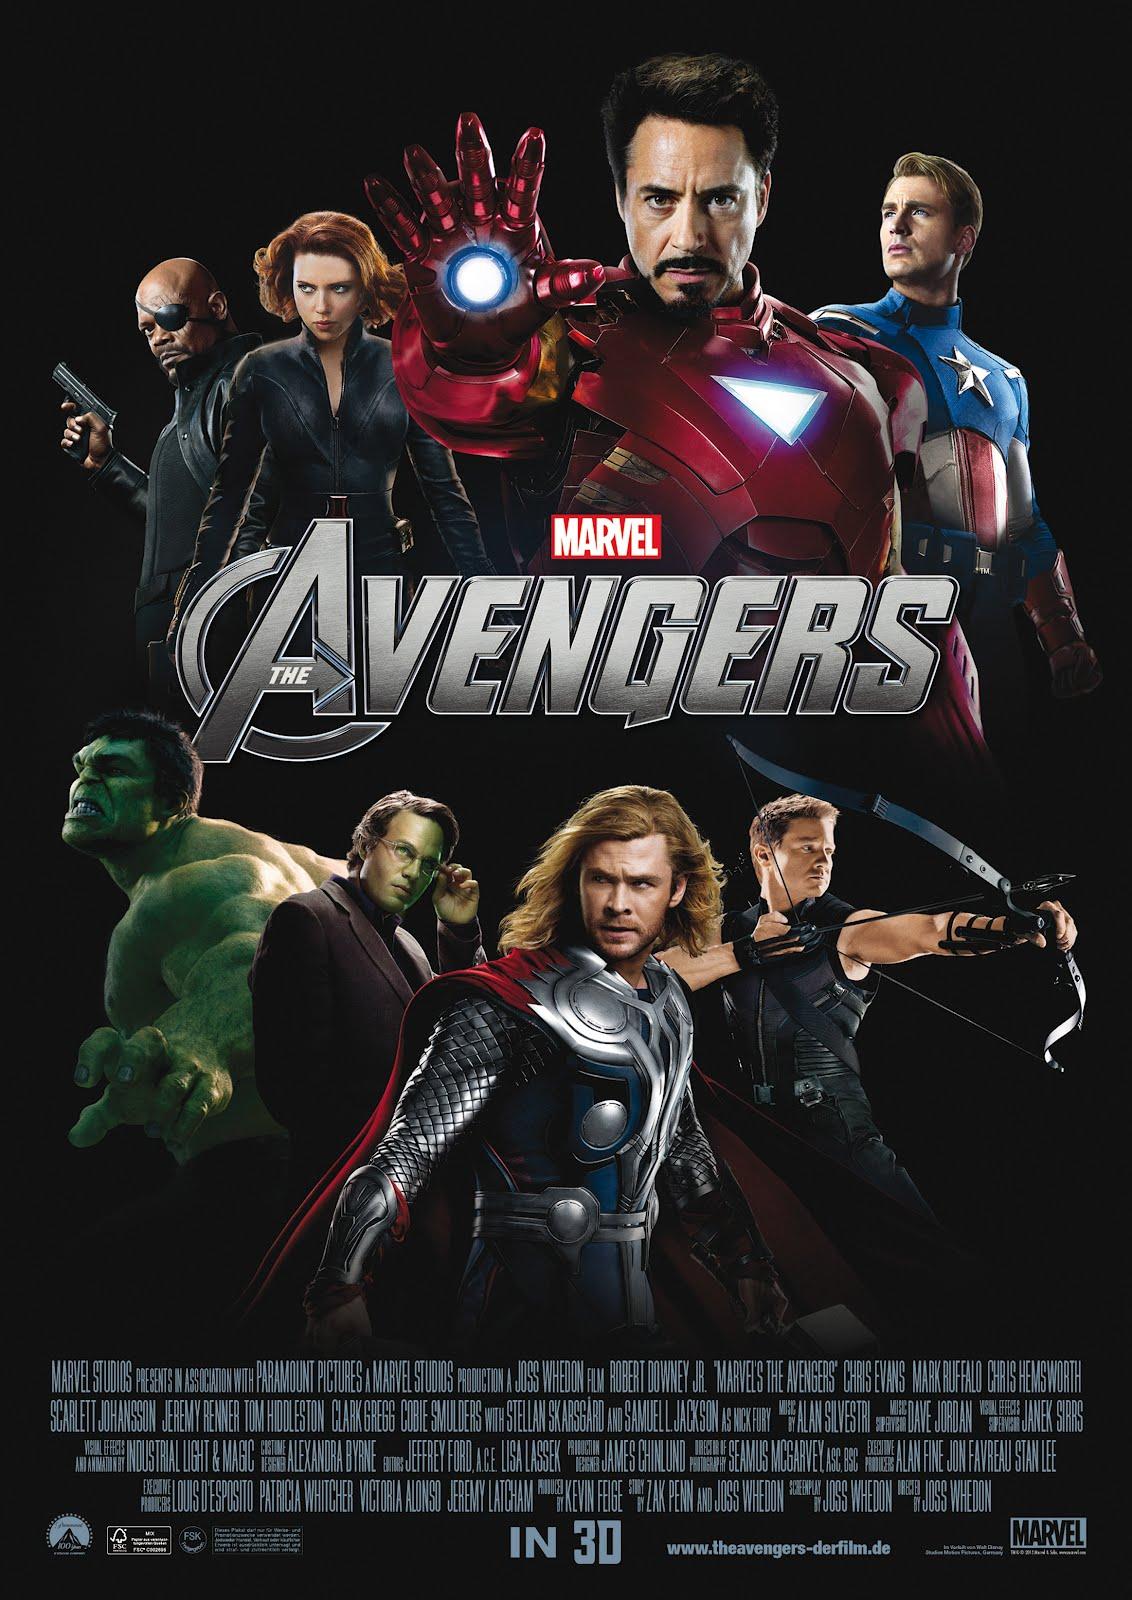 http://4.bp.blogspot.com/-OPYeKJcg7QI/T3Lm2HsDQYI/AAAAAAAAABw/fFy7t3wvi5A/s1600/Avengers-German-Poster.jpg